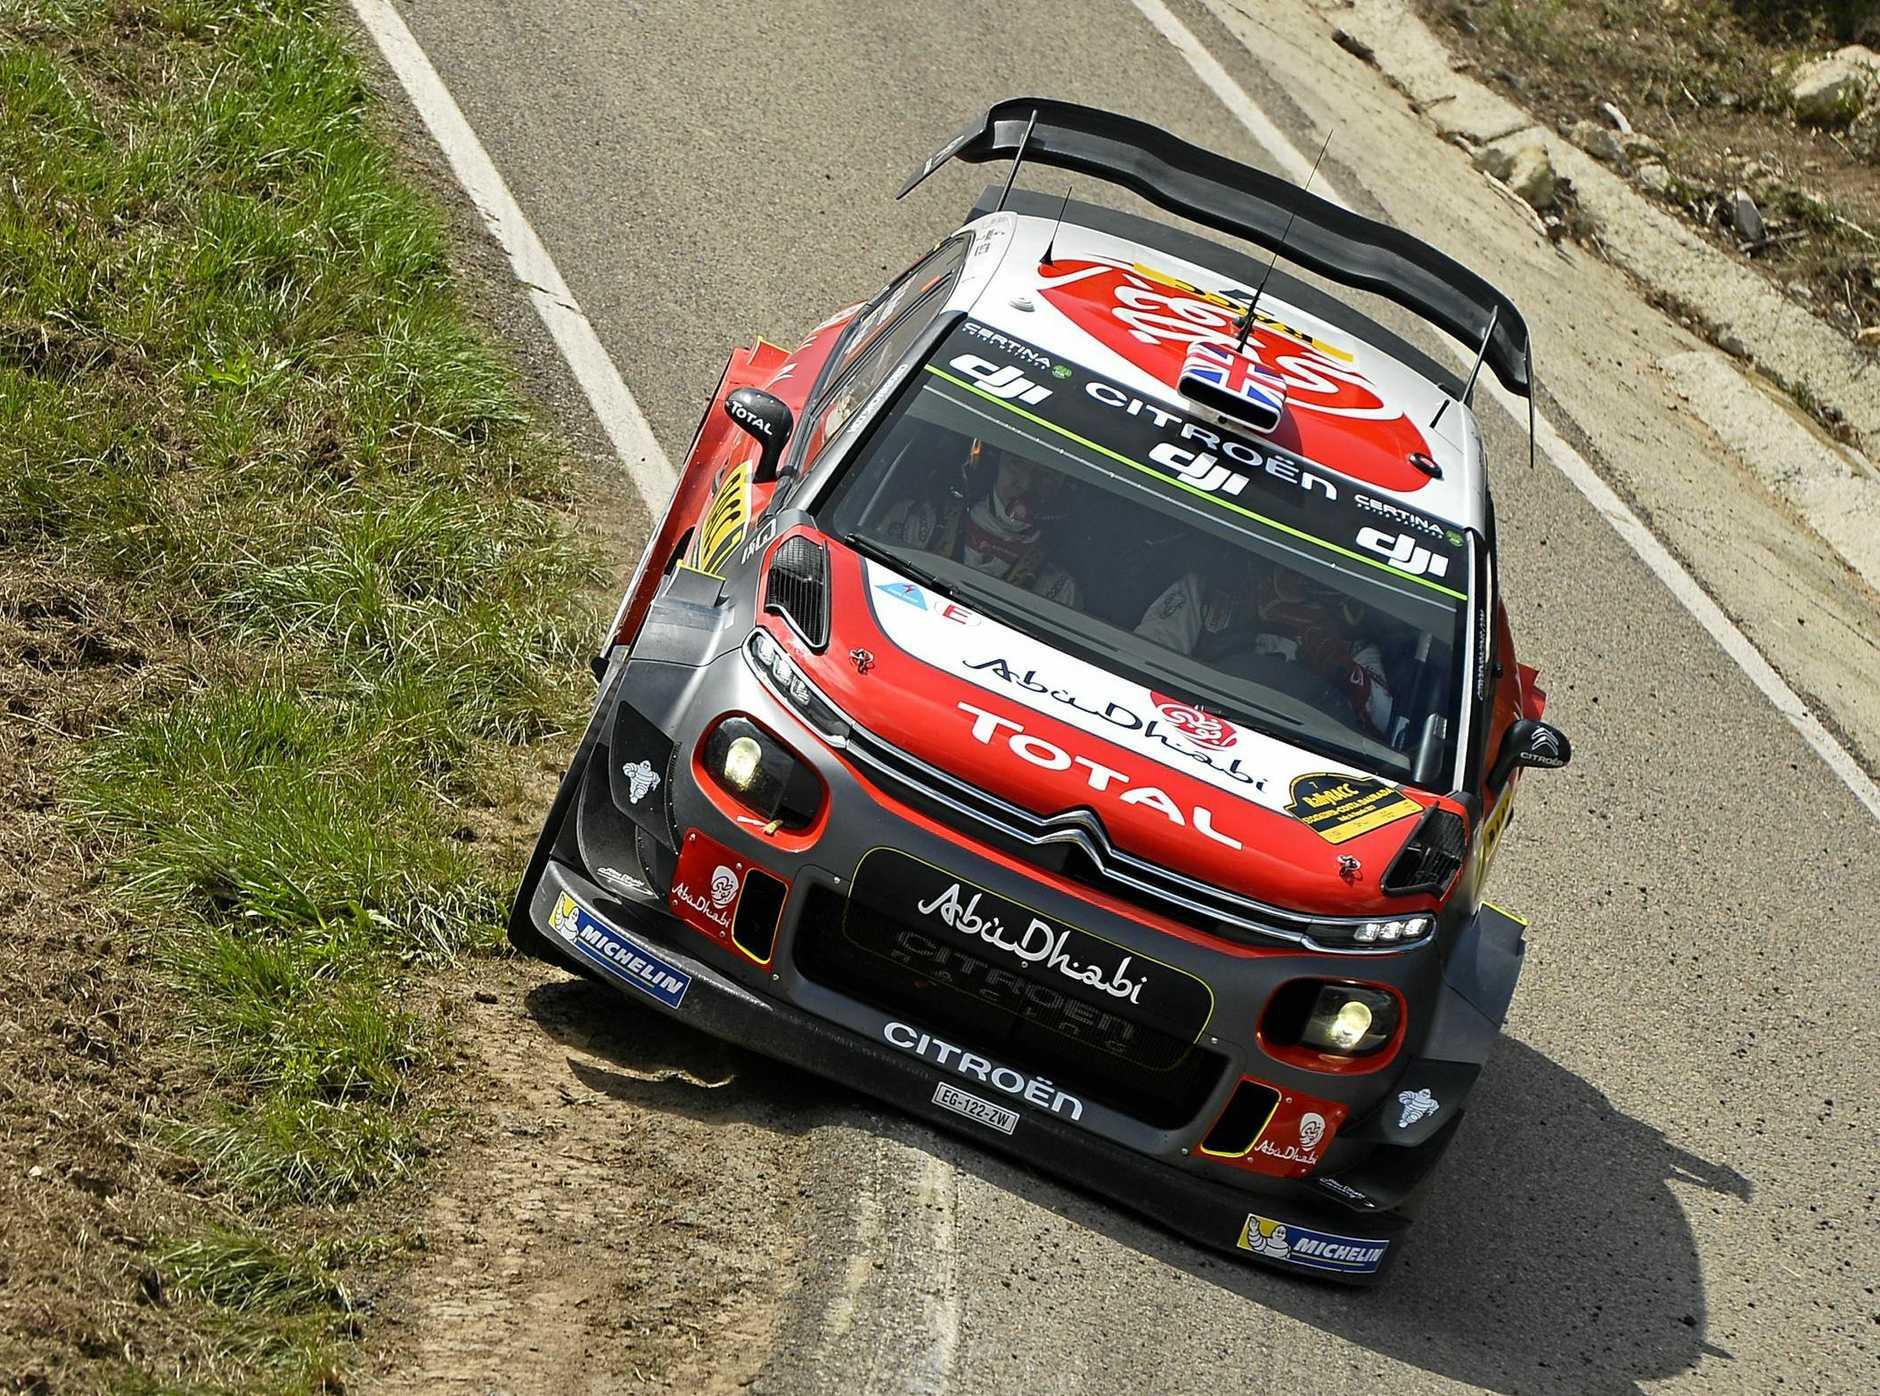 Kris Meeke cuts a corner in his Citroën on the way to victory in Rally de España.